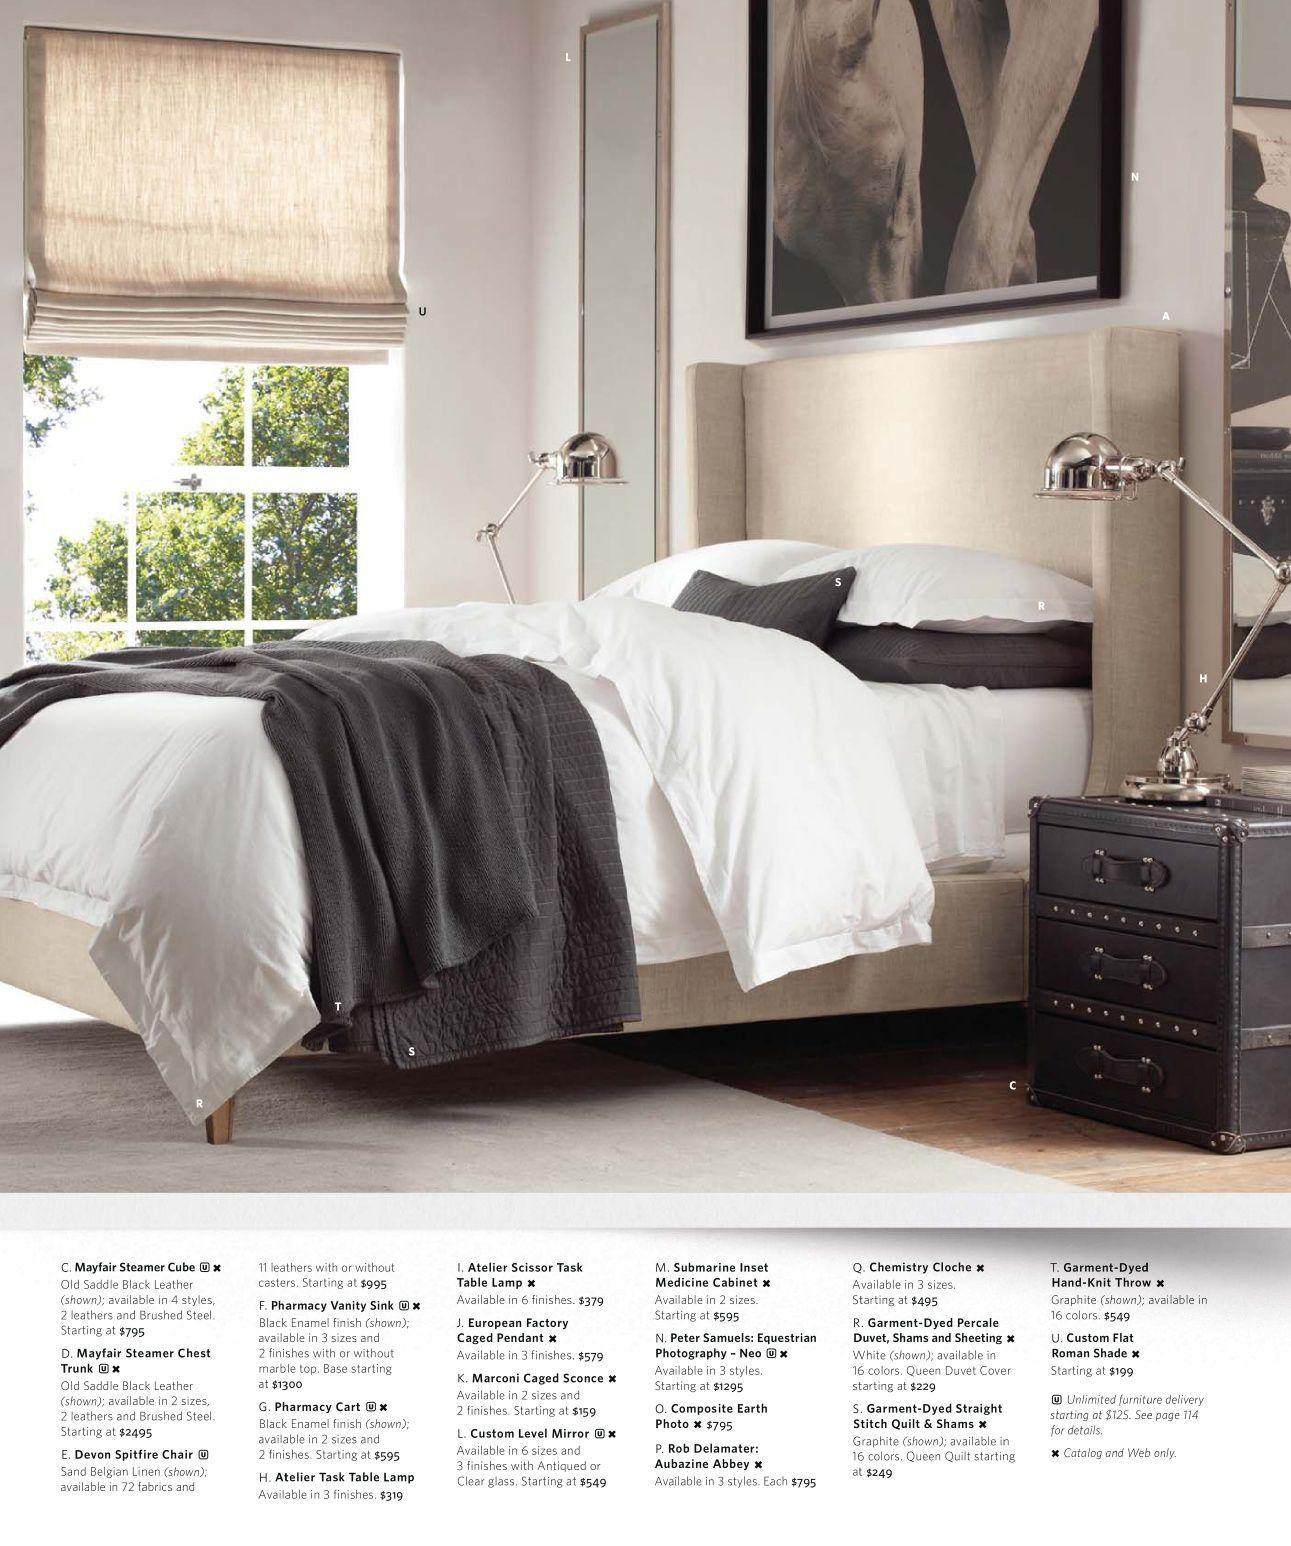 2013 Small Spaces Catalog Restoration Hardware Bedroom